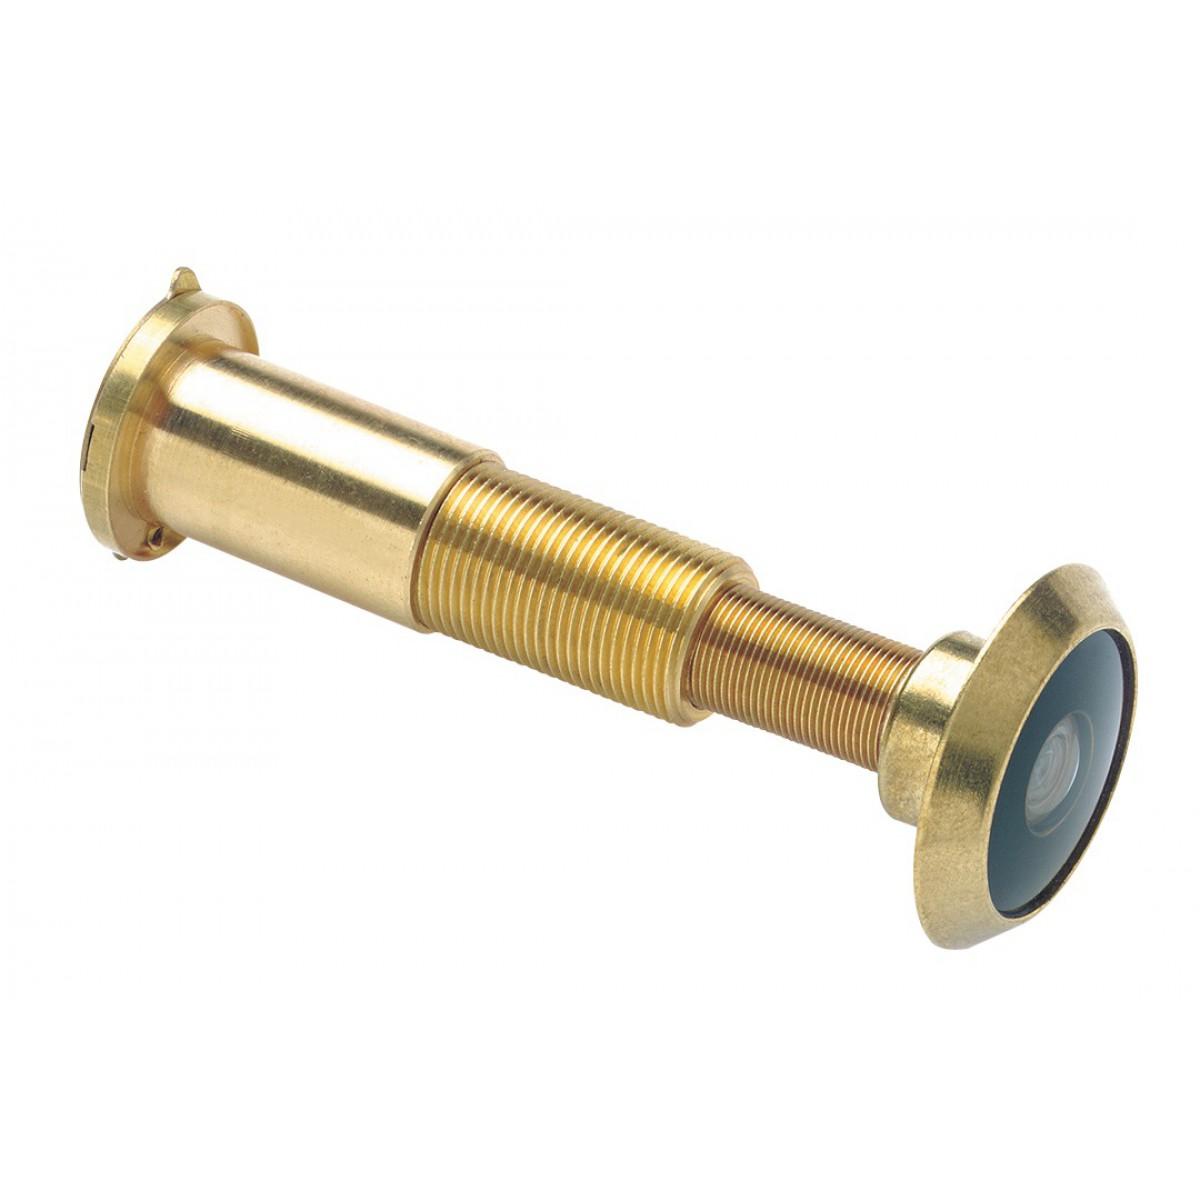 Judas optique laiton Vizer Socona - Pour porte de 37 à 62 mm - Doré